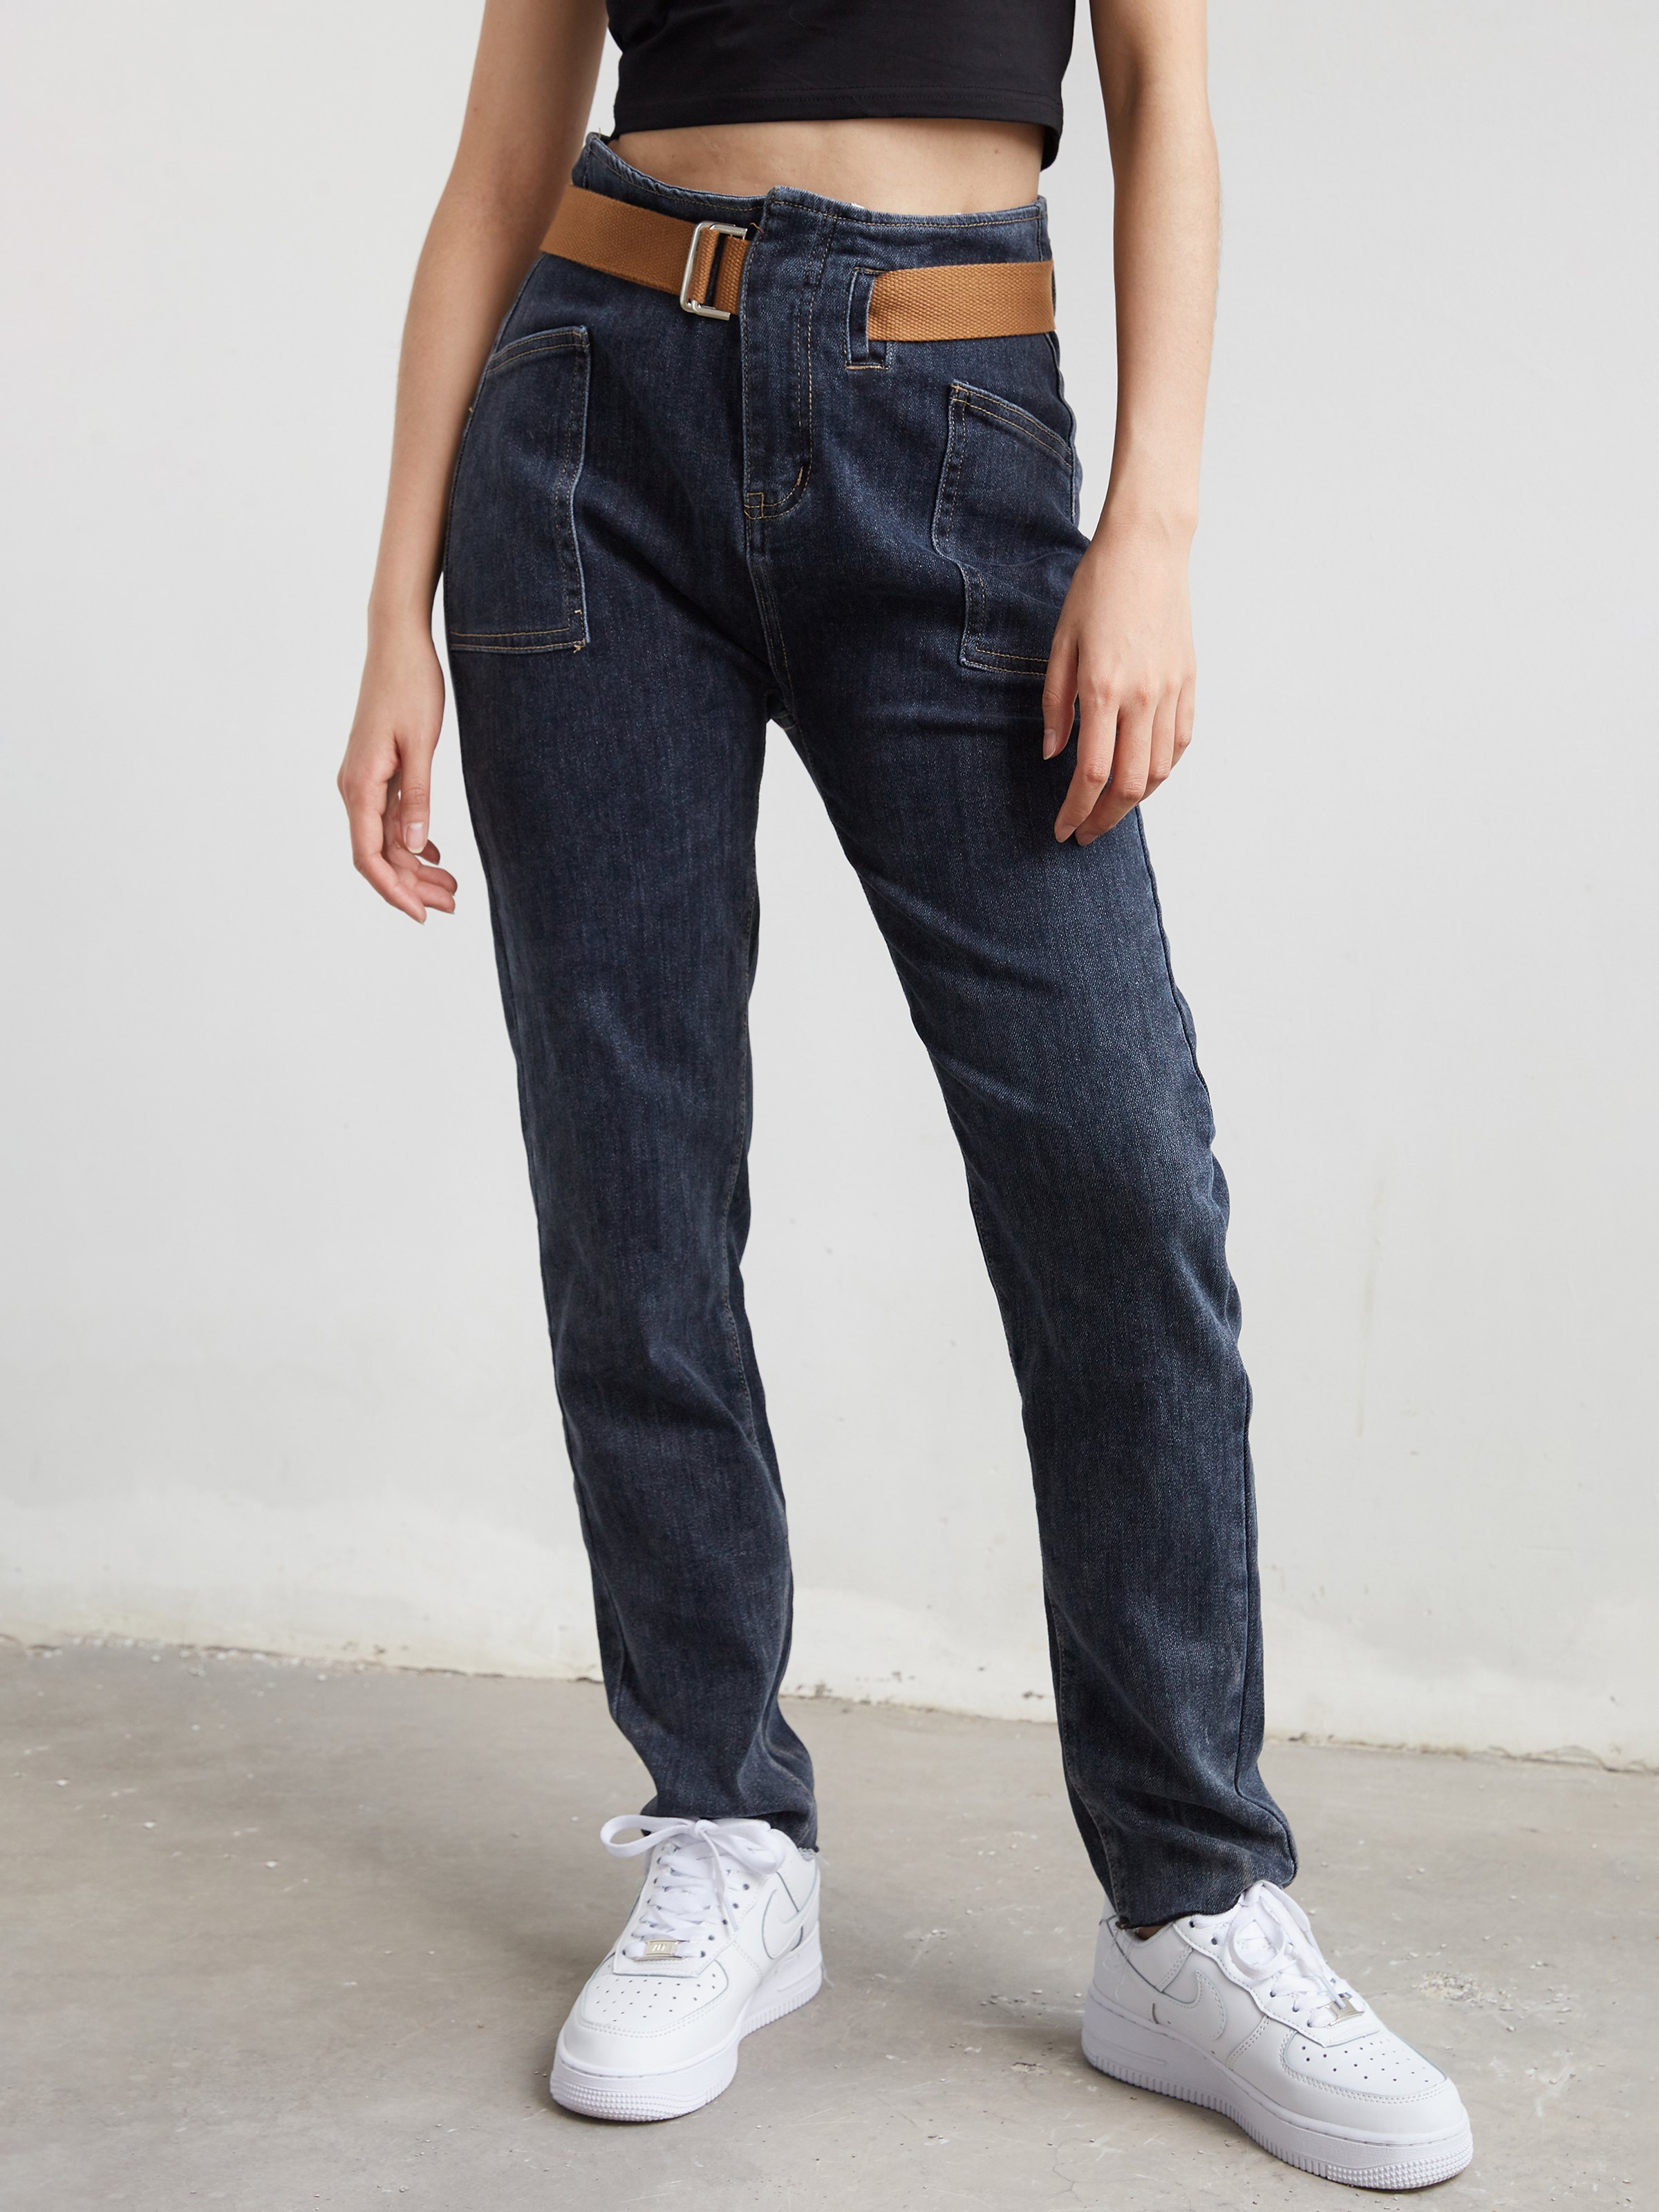 Belt Detail Cargo Jeans - Navy Blue M